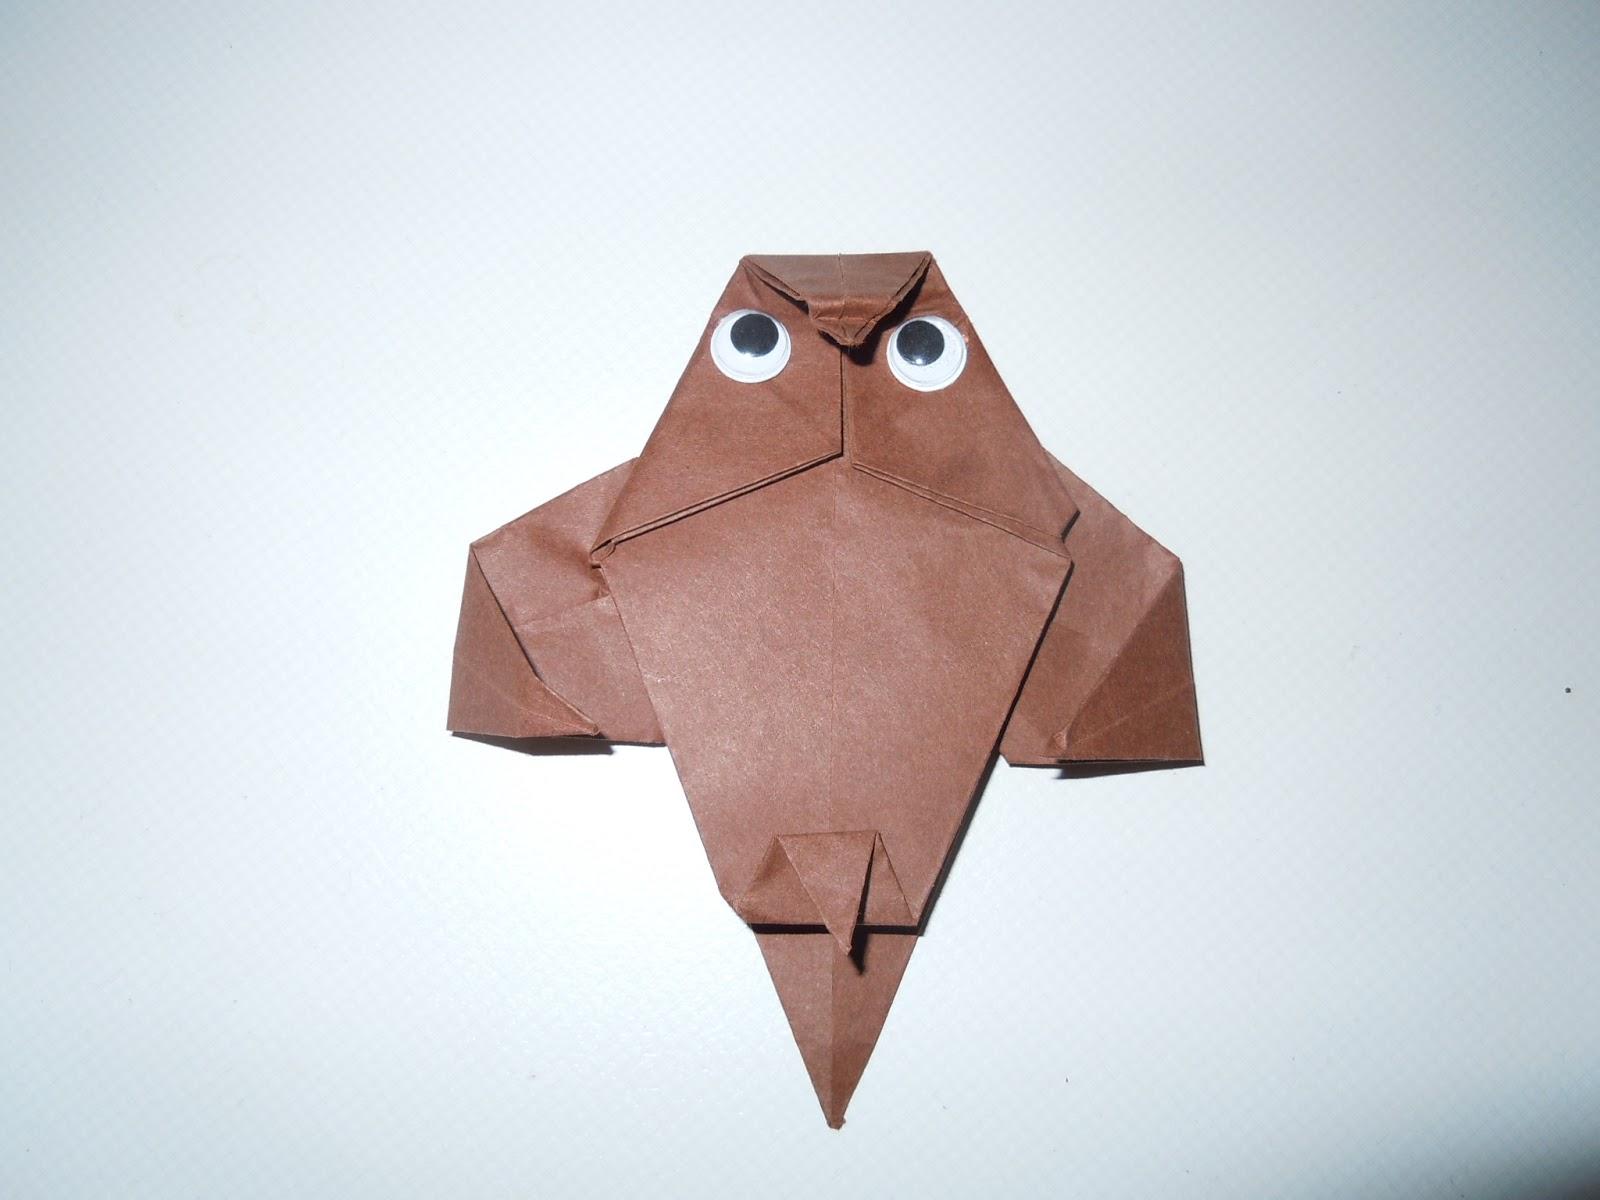 Origami Eule Anleitung  Americas Best Lifechangers